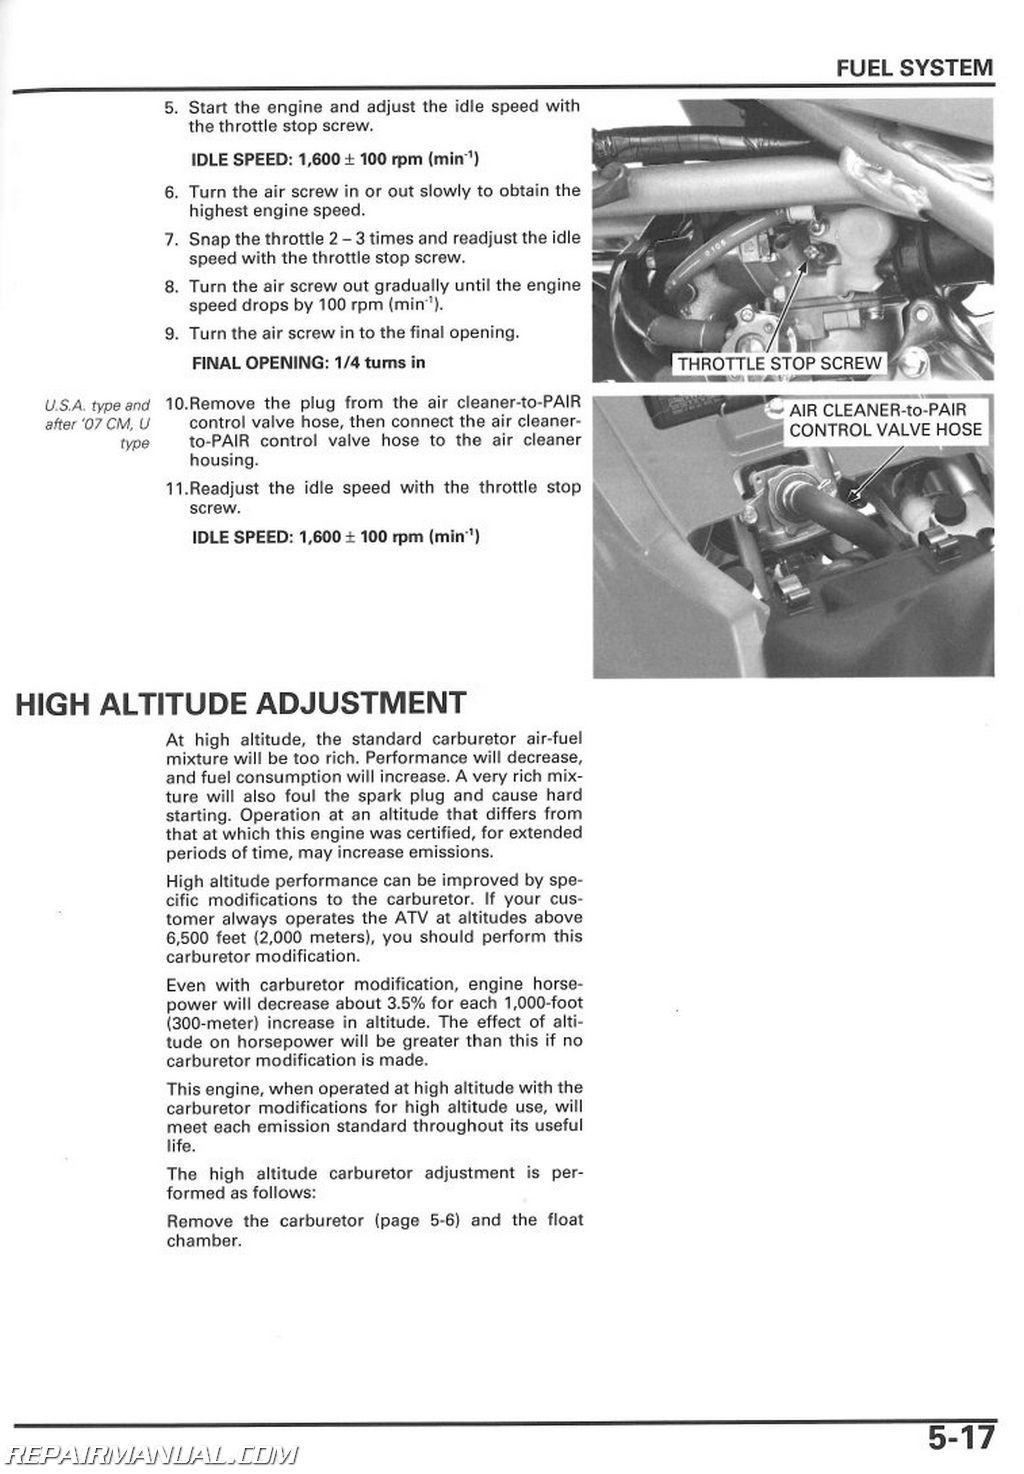 2006 2018 honda trx90ex trx90x atv service manual Wiring Diagram For 2007 Honda Trx 90 wire diagram on a honda trx 90 list